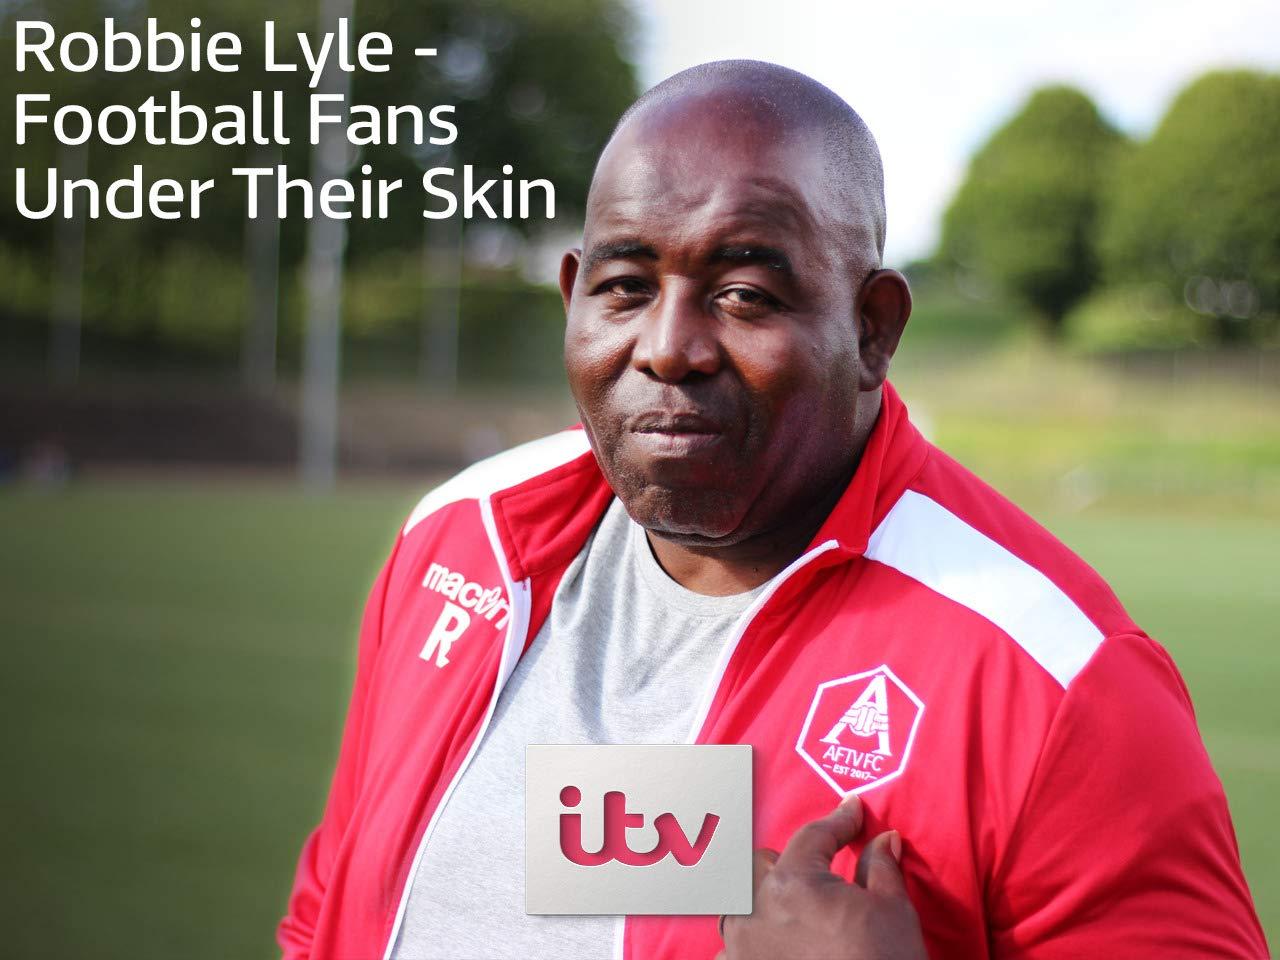 Robbie Lyle - Football Fans Under Their Skin - Season 1